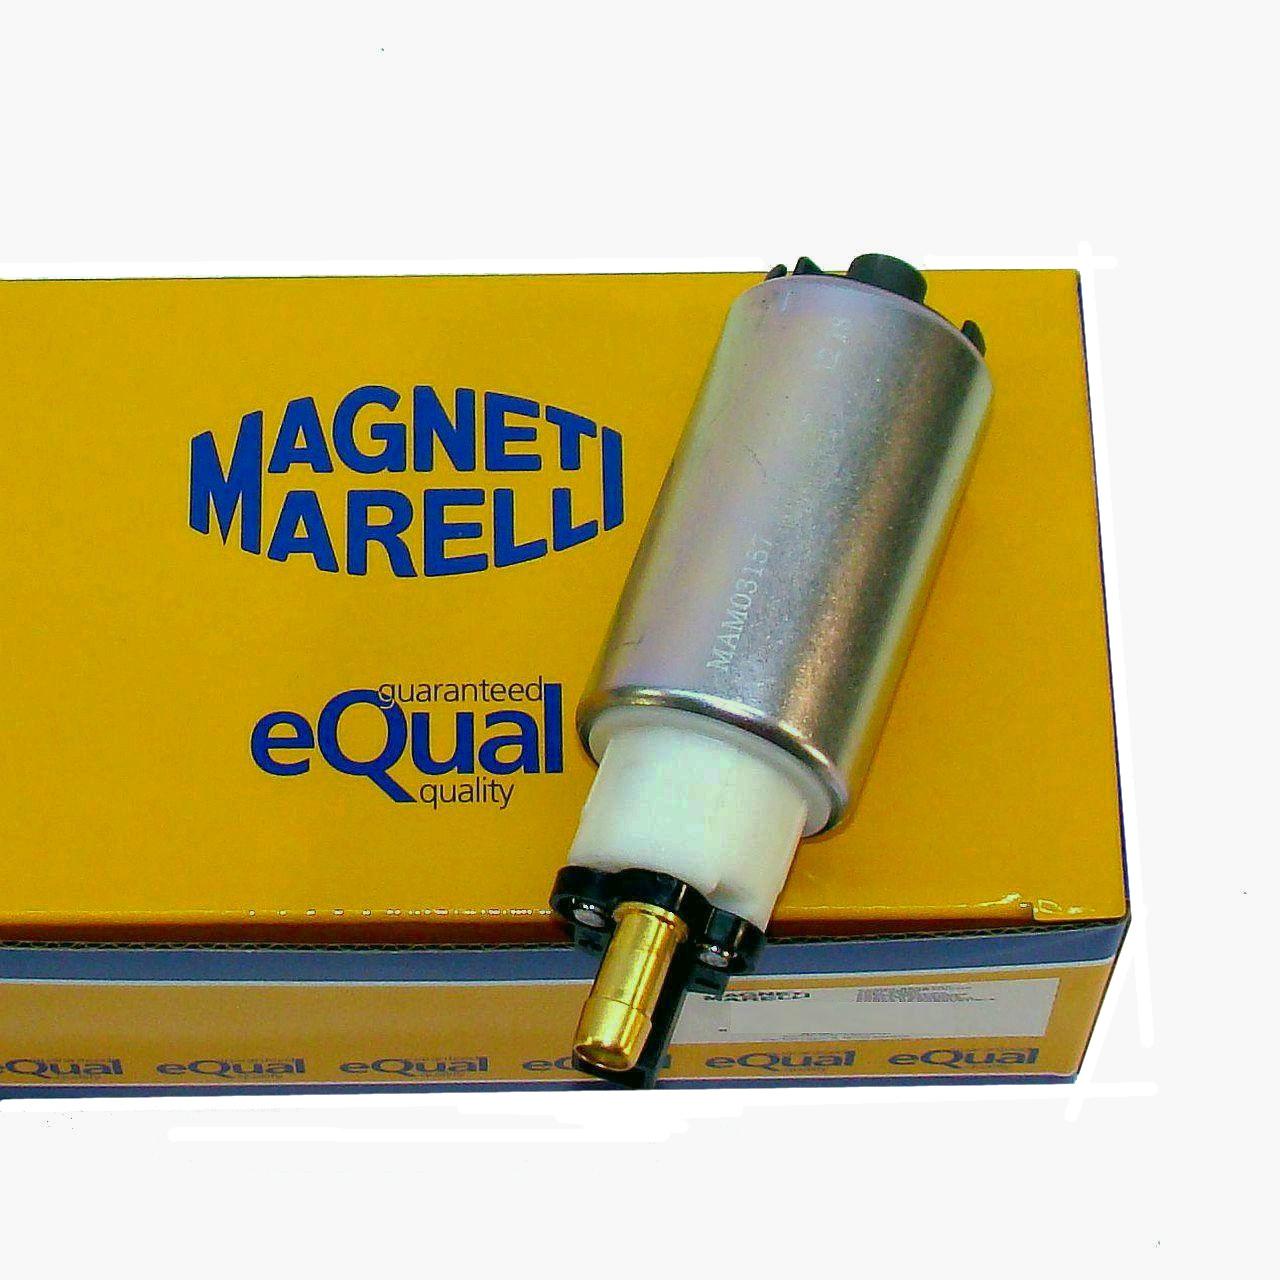 Kraftstoffpumpe Benzinpumpe MAZDA MX-6 GE 2.0 2.0 24V 2.5i 24V Magneti Marelli